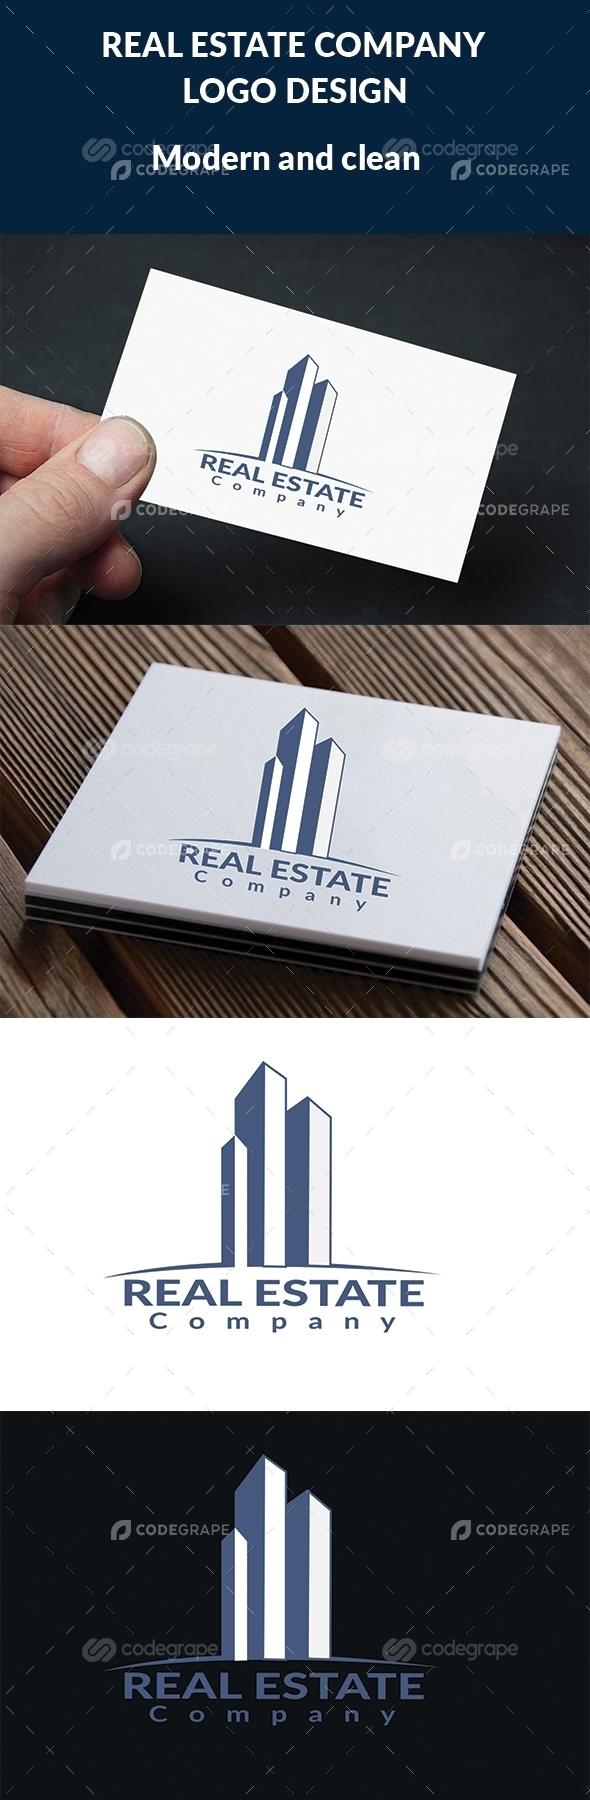 Real Estate Company Logo